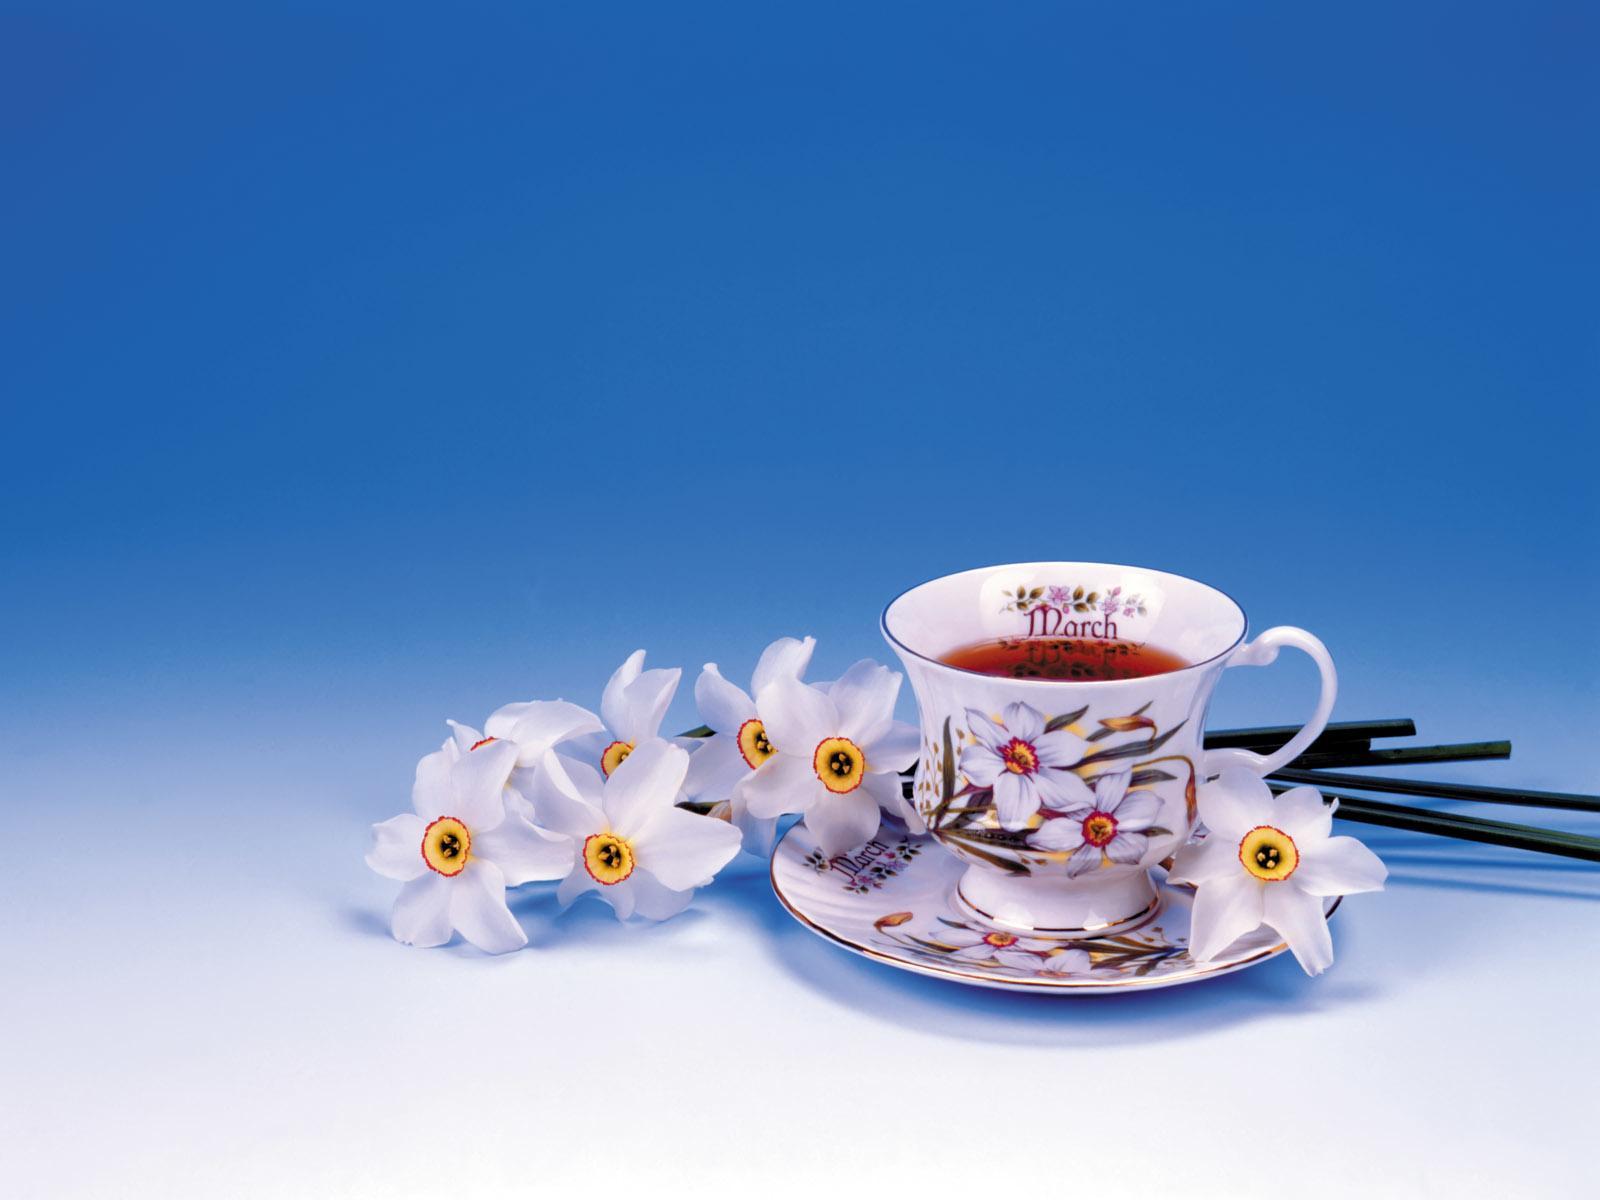 Tea wallpapers HD quality